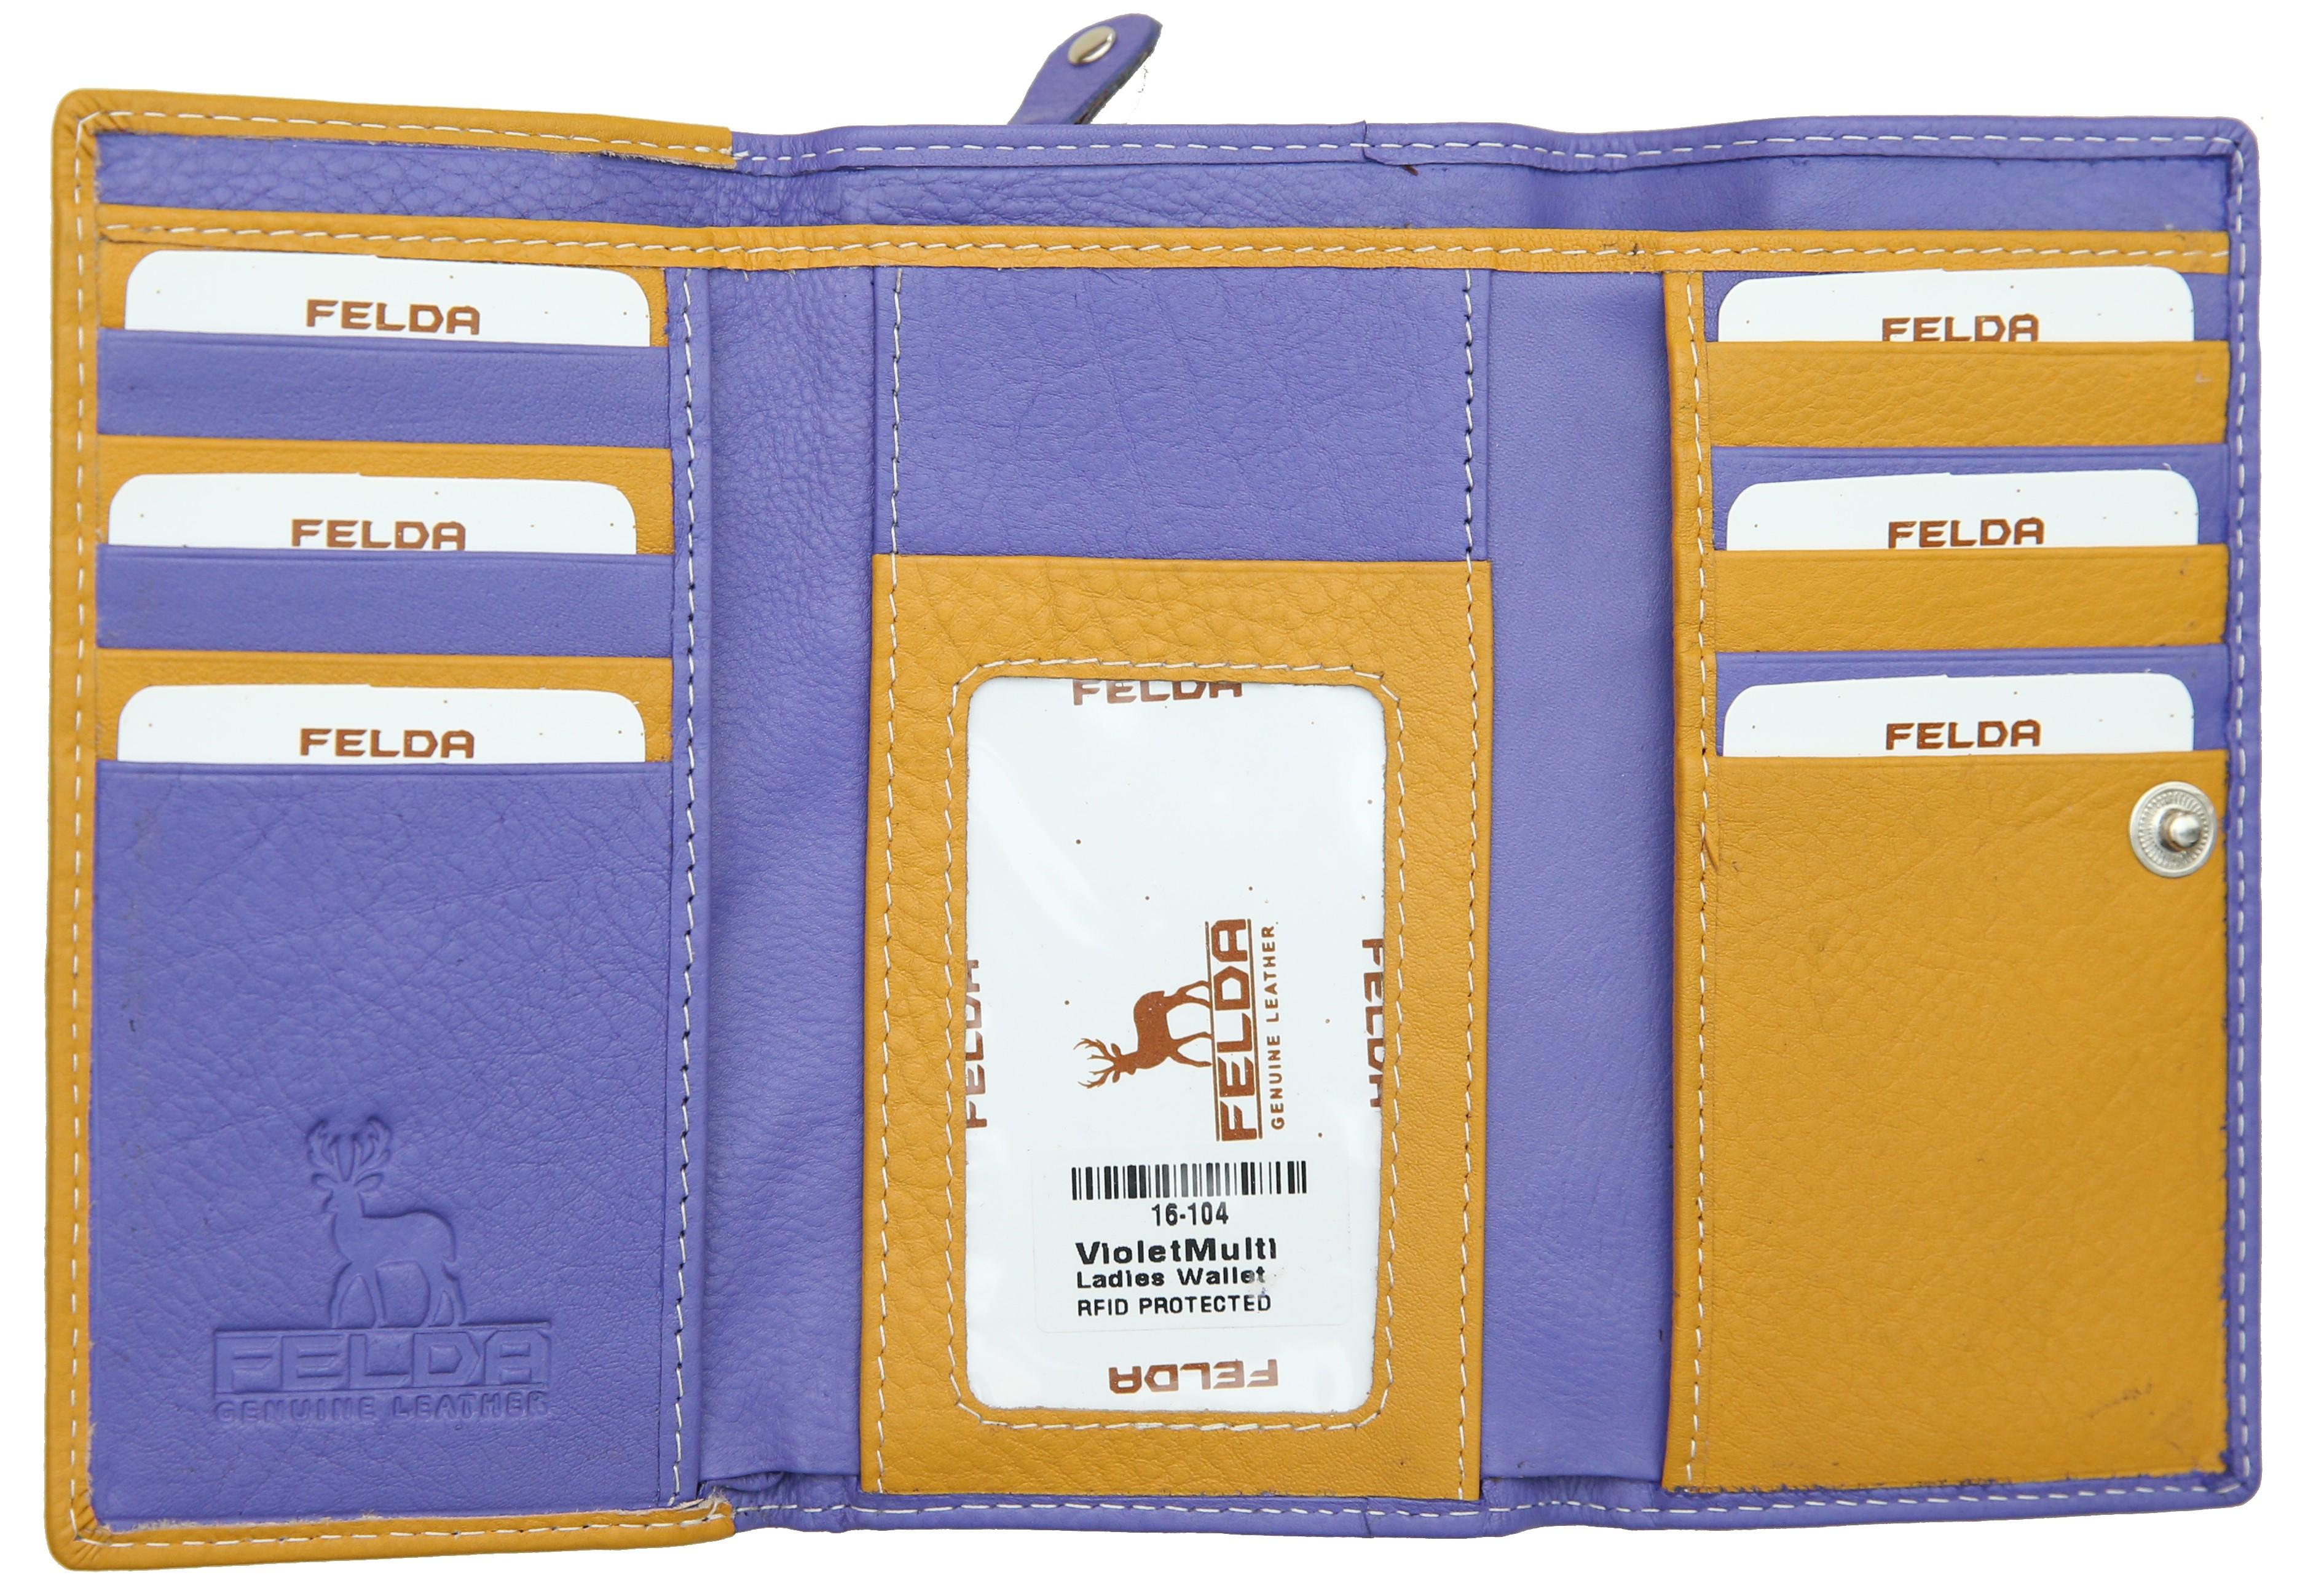 Felda-Portefeuille-pour-cartes-de-credit-cuir-souple-plusieurs-coloris miniature 34